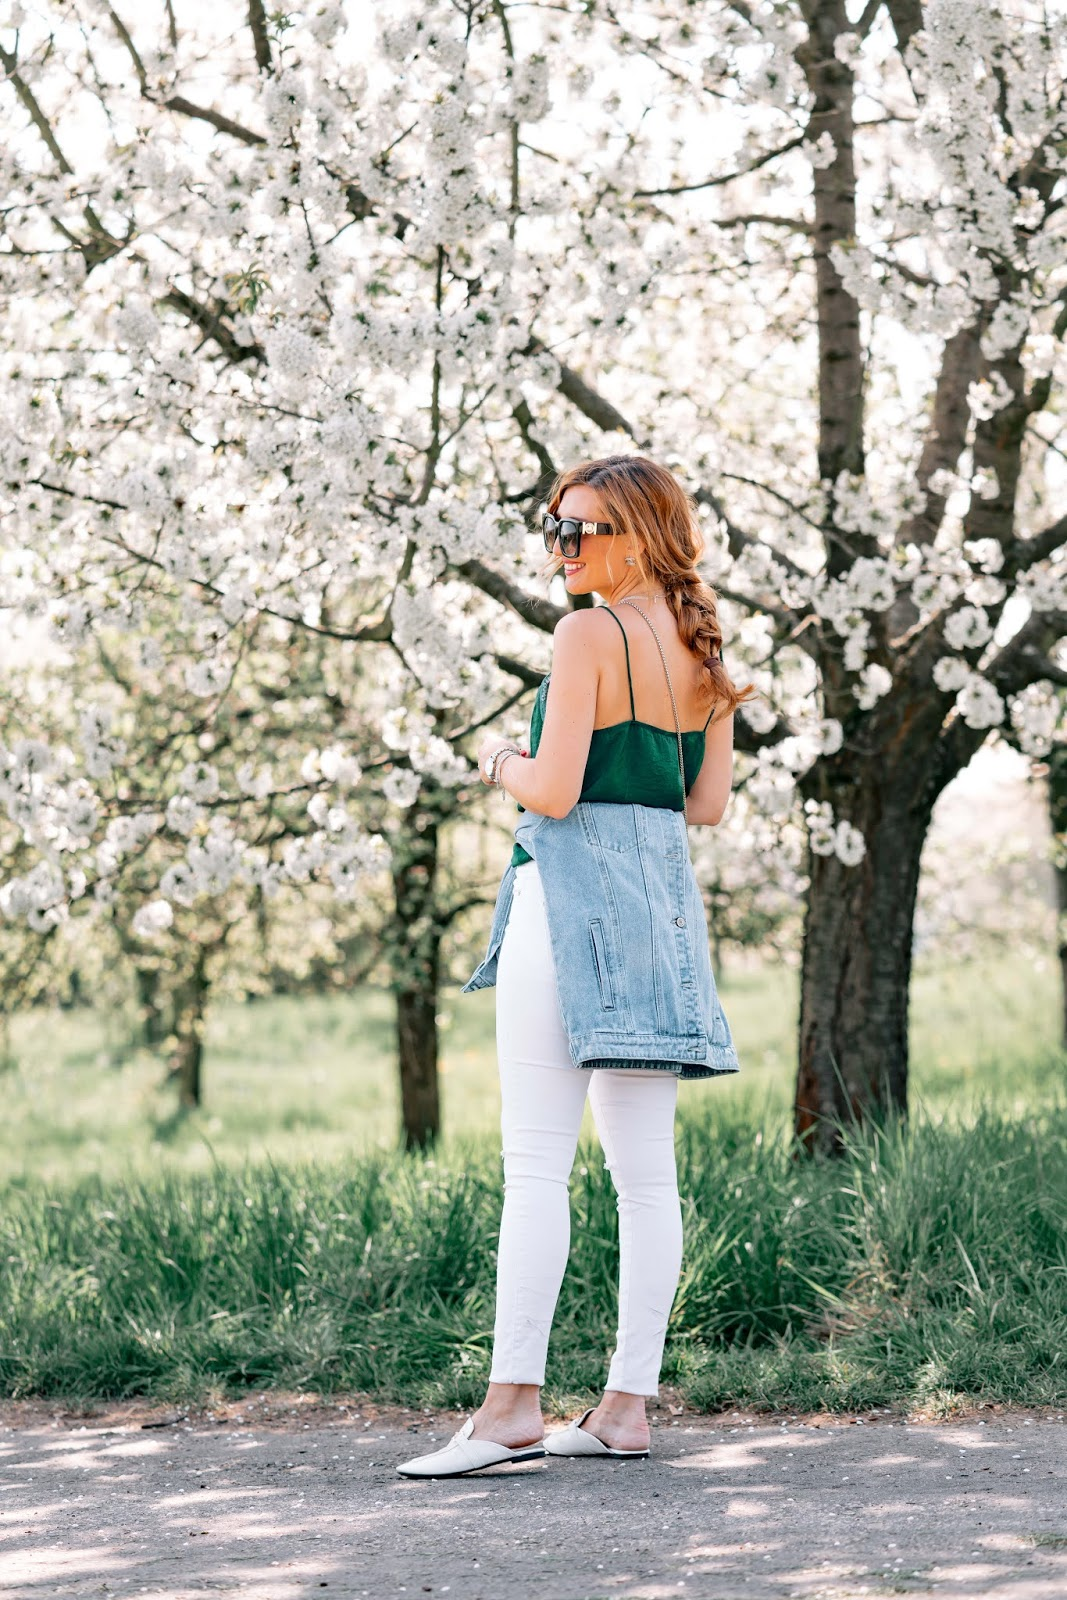 Satin-pflegen-outfitinspiration-weiße-hose-kombinieren-satin-top-kombinieren-fashionstylebyjohanna-Frühling-sommeroutfit-inspiration (6)